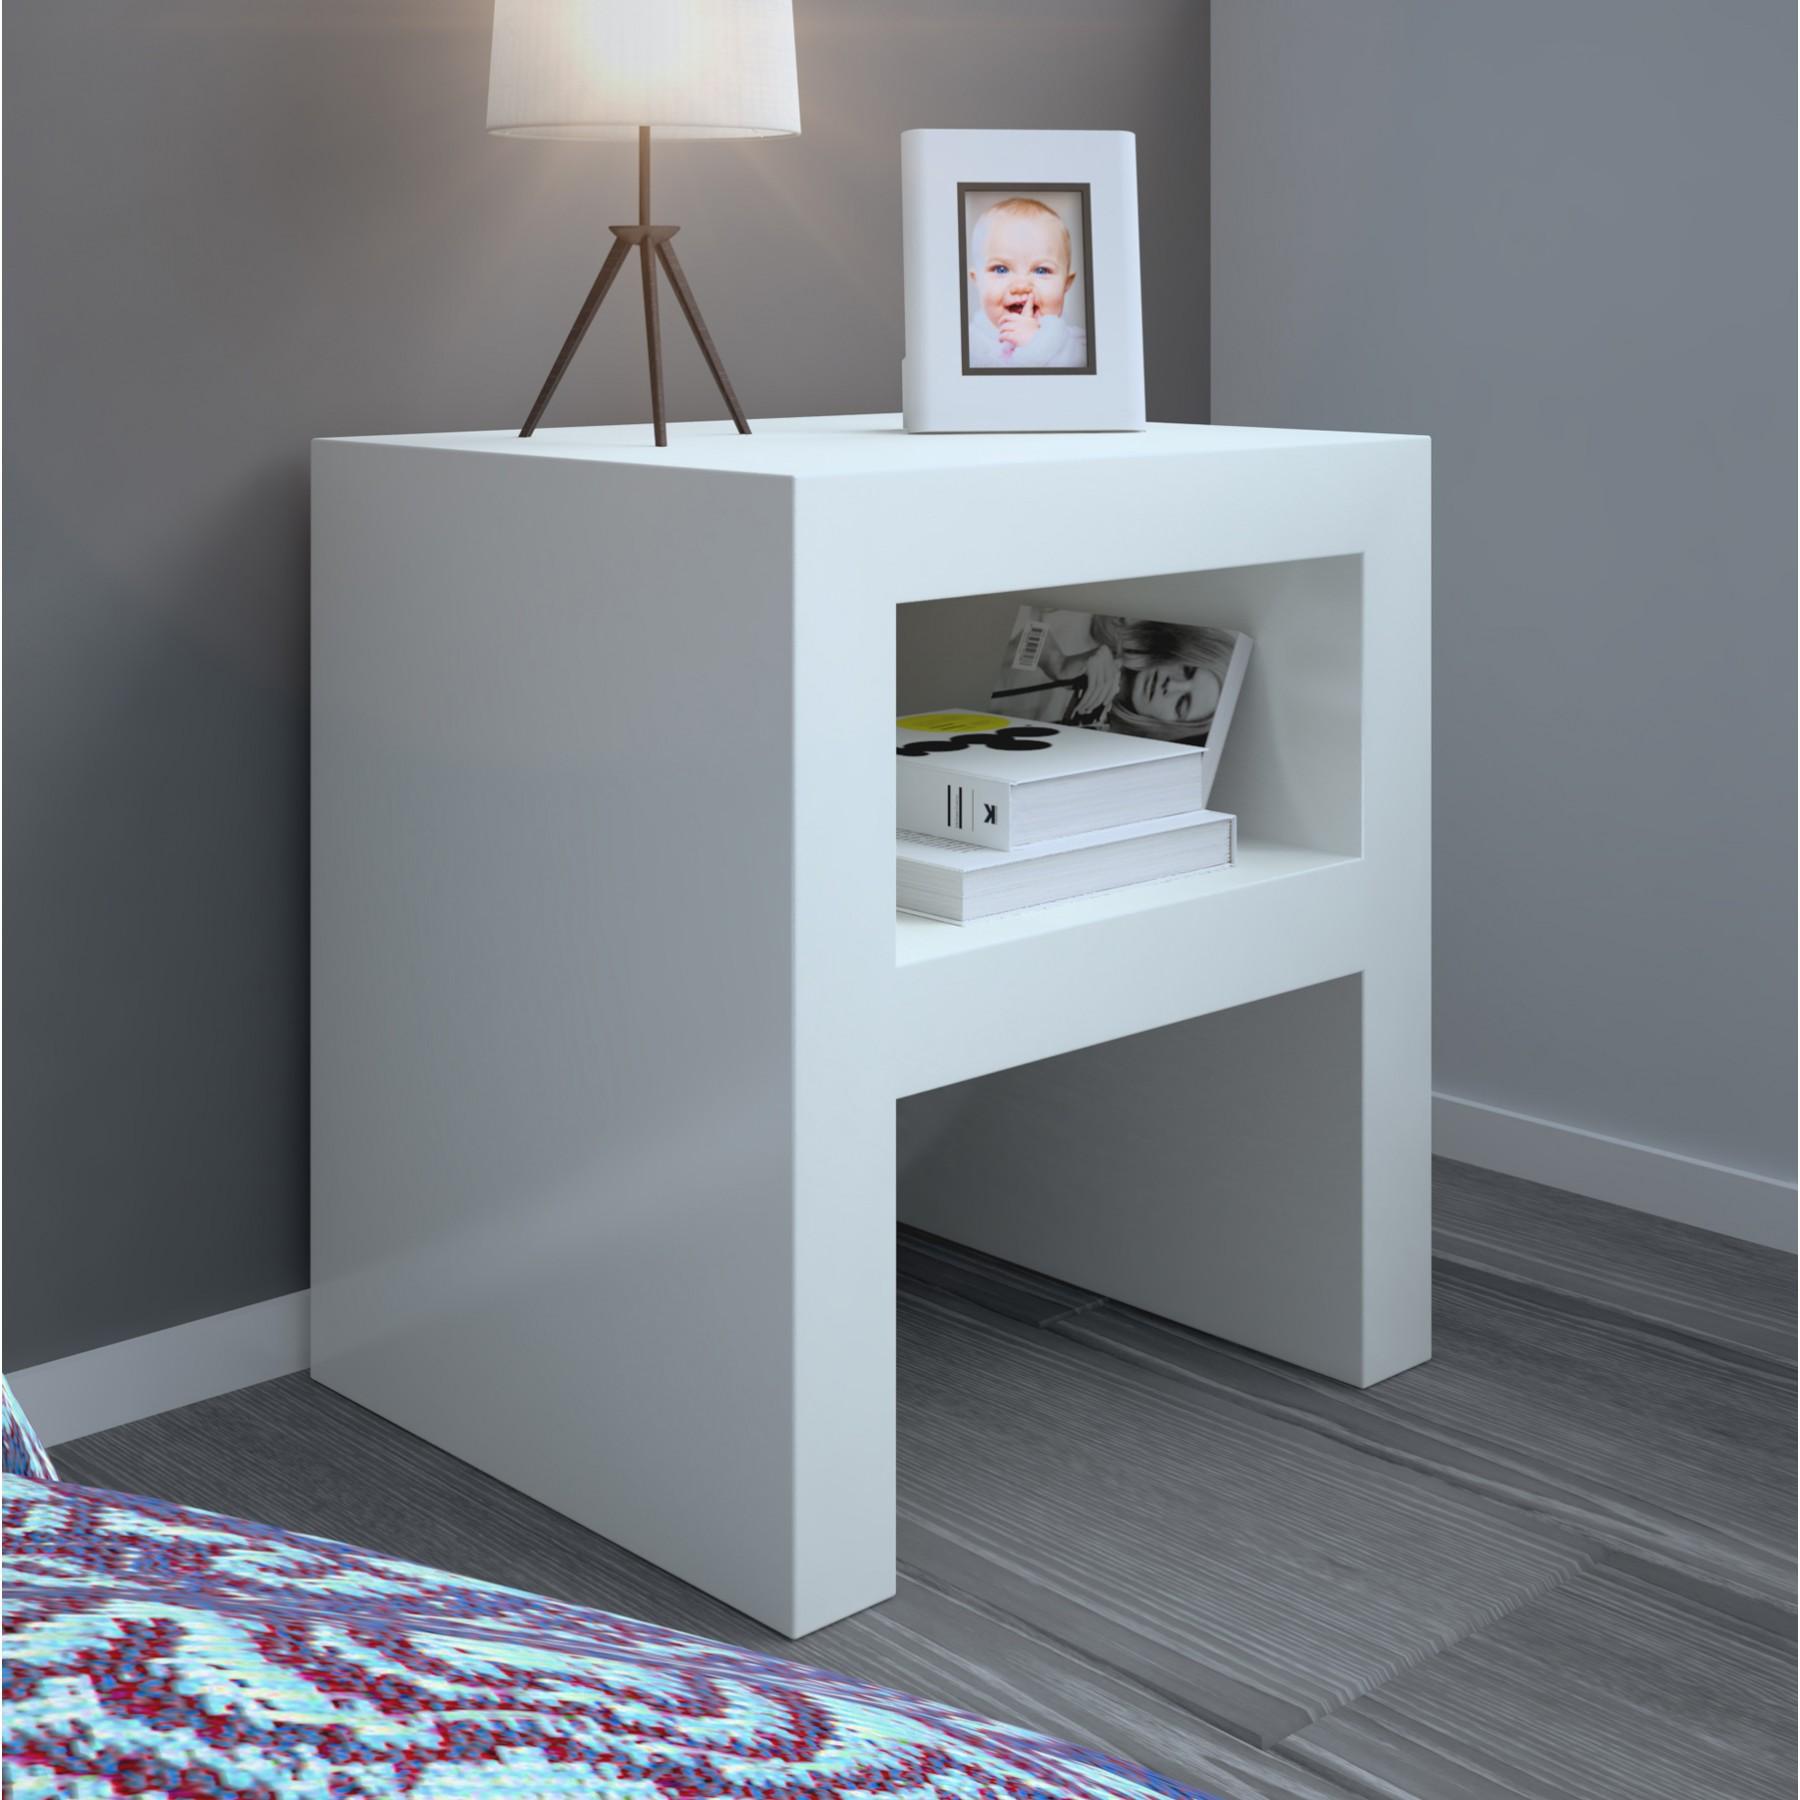 Mesa de noche minimalista moderna lacada blanca de dise o - Mesitas de noche blancas conforama ...